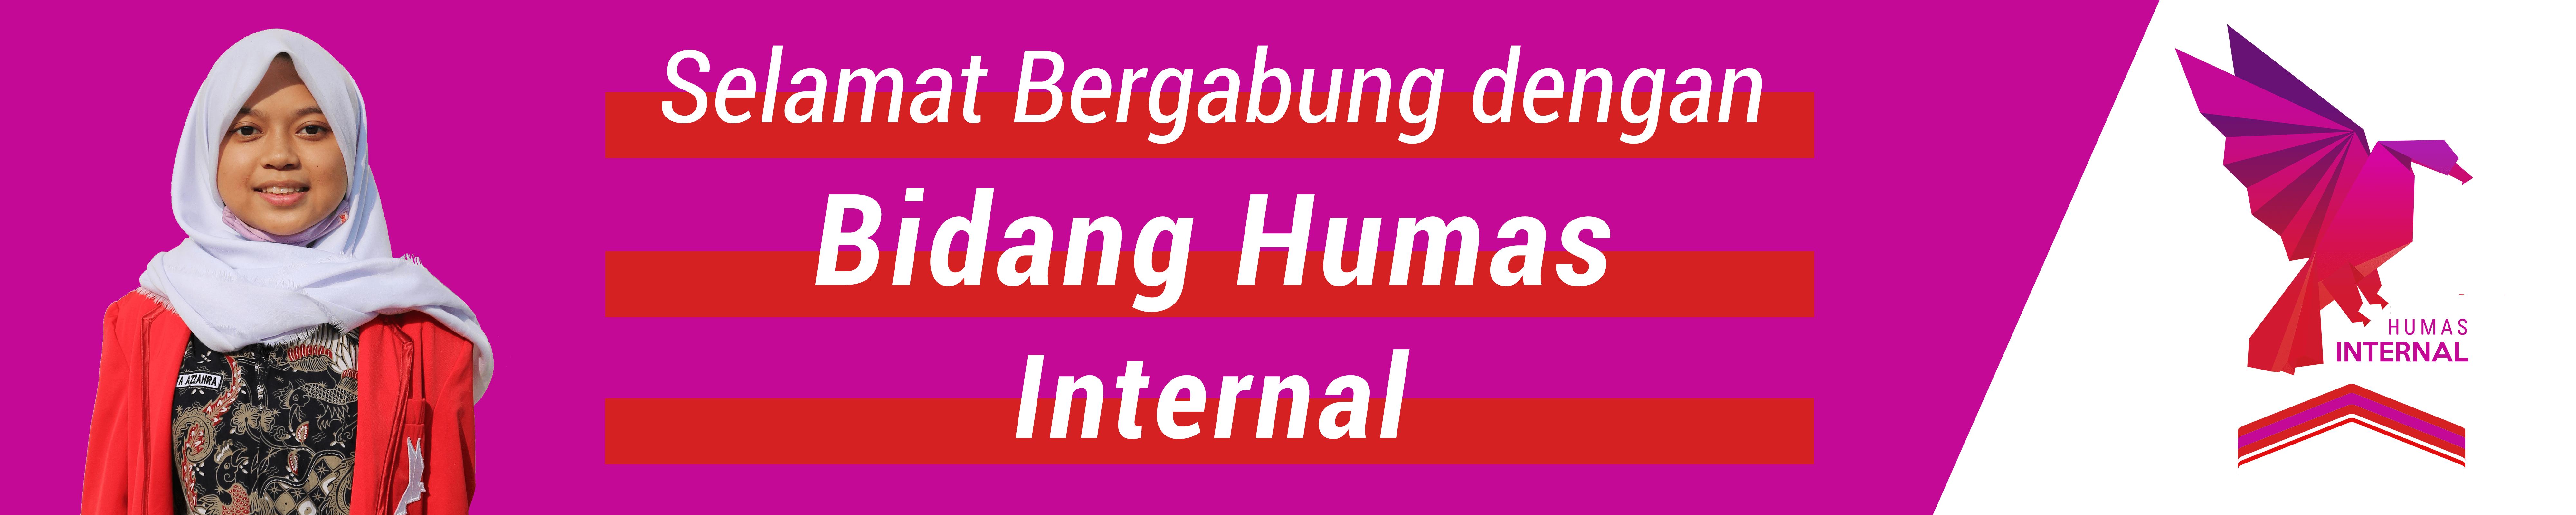 internal (1)-min